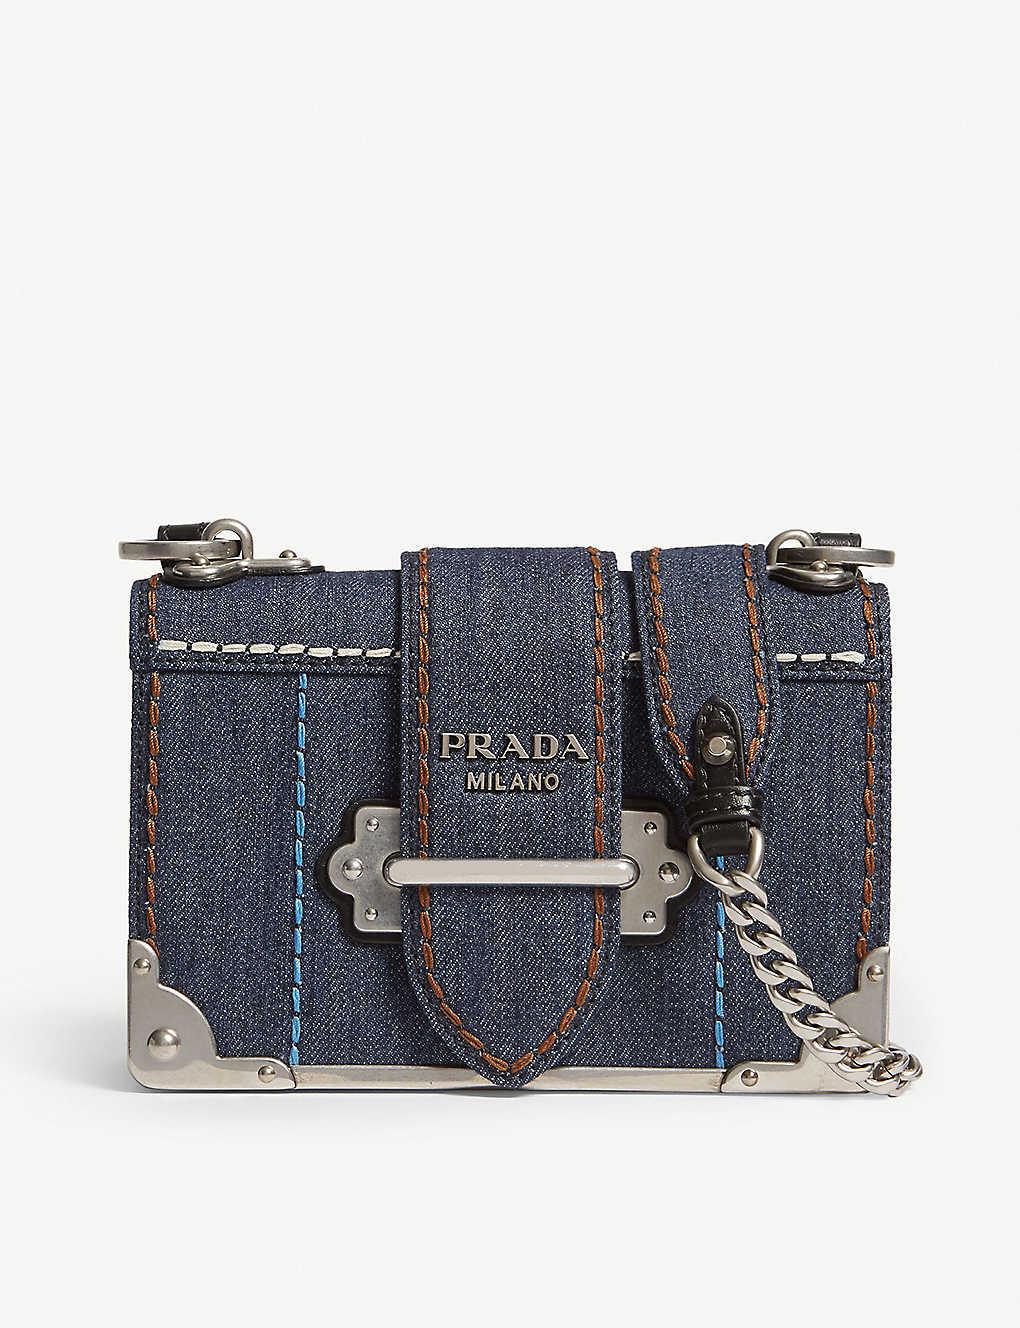 69d5fefe3a2a PRADA - Cahier denim mini shoulder bag | Selfridges.com